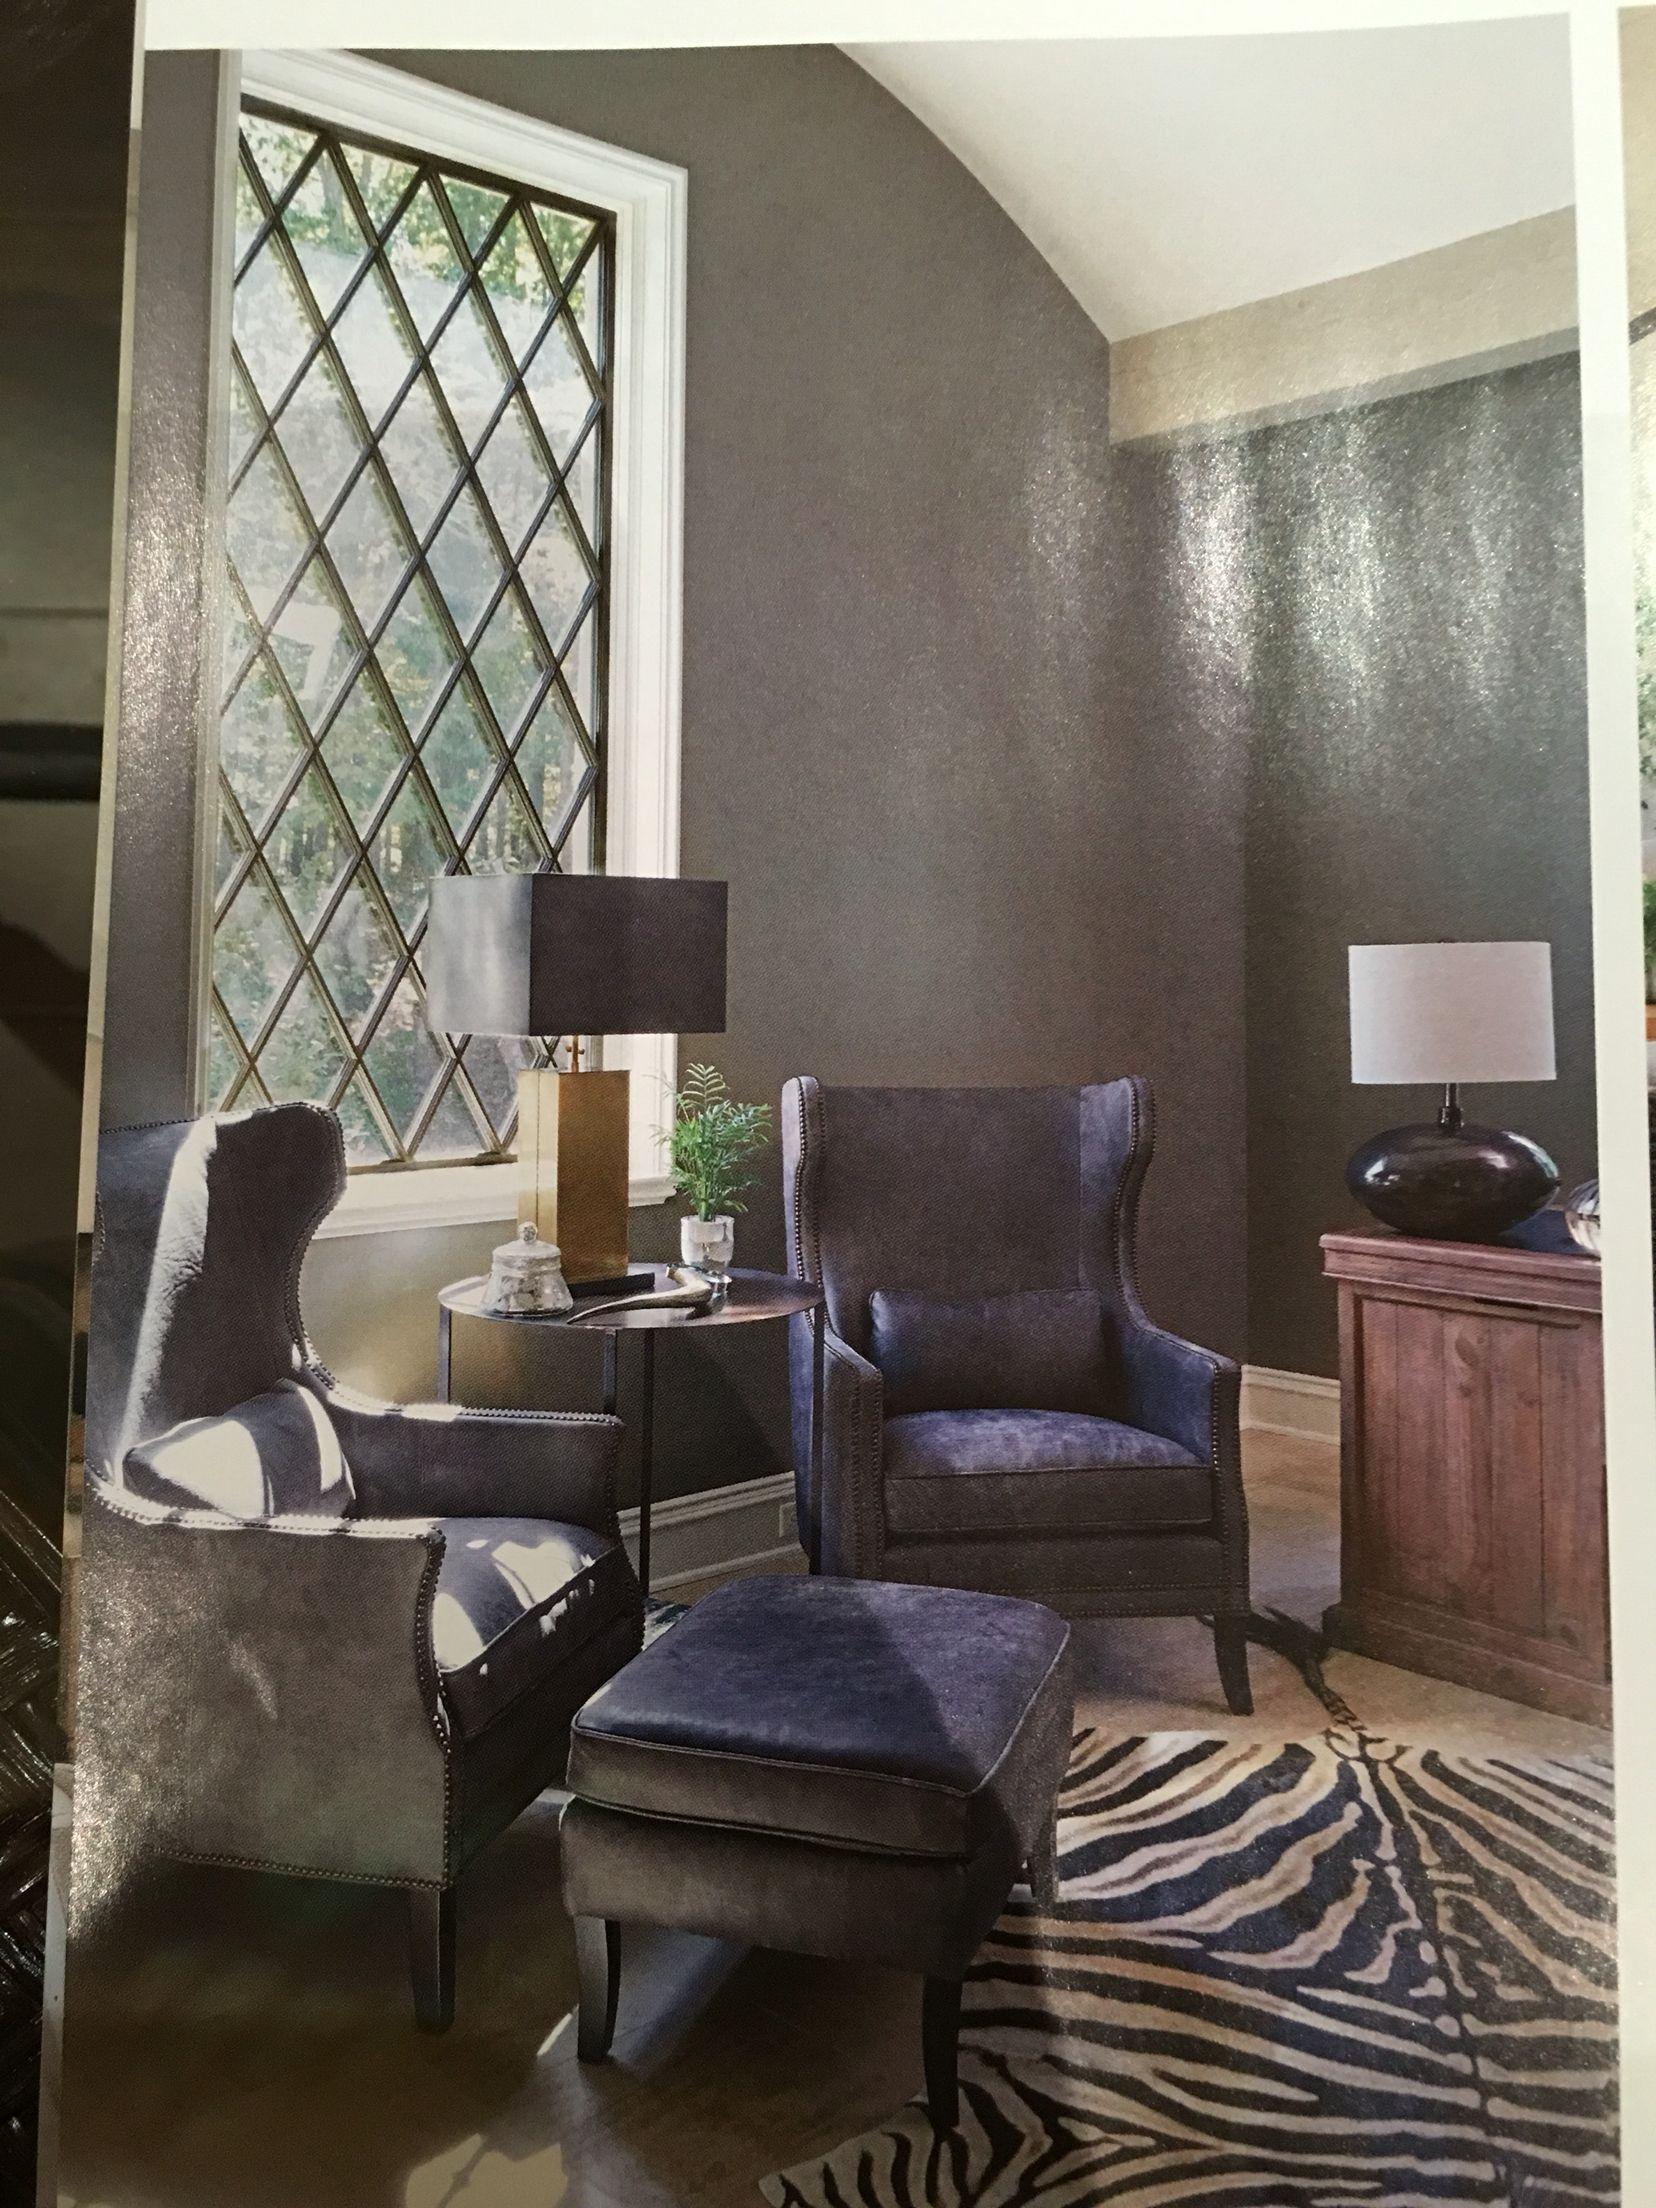 Gary Olivieri Richard Tubb Interior Design Birmingham With